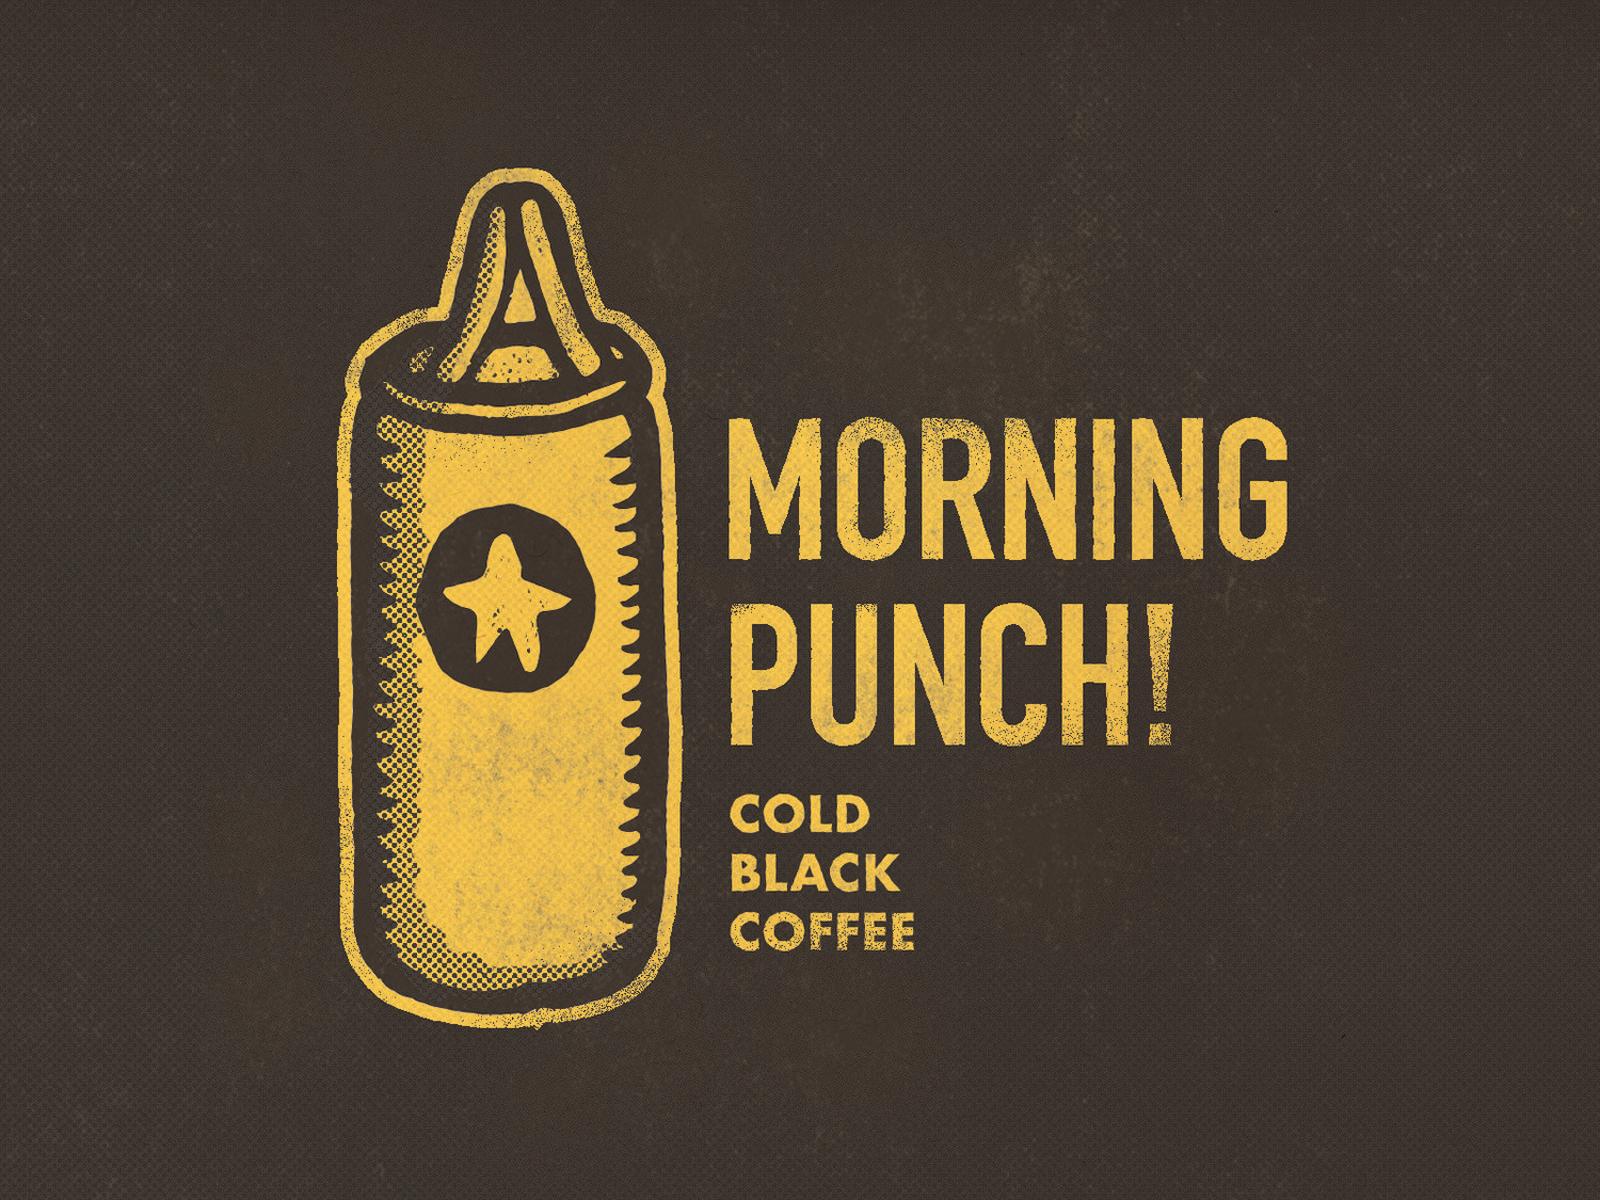 stuffed-brain-studio-morning-punch-brand-identity-02.png